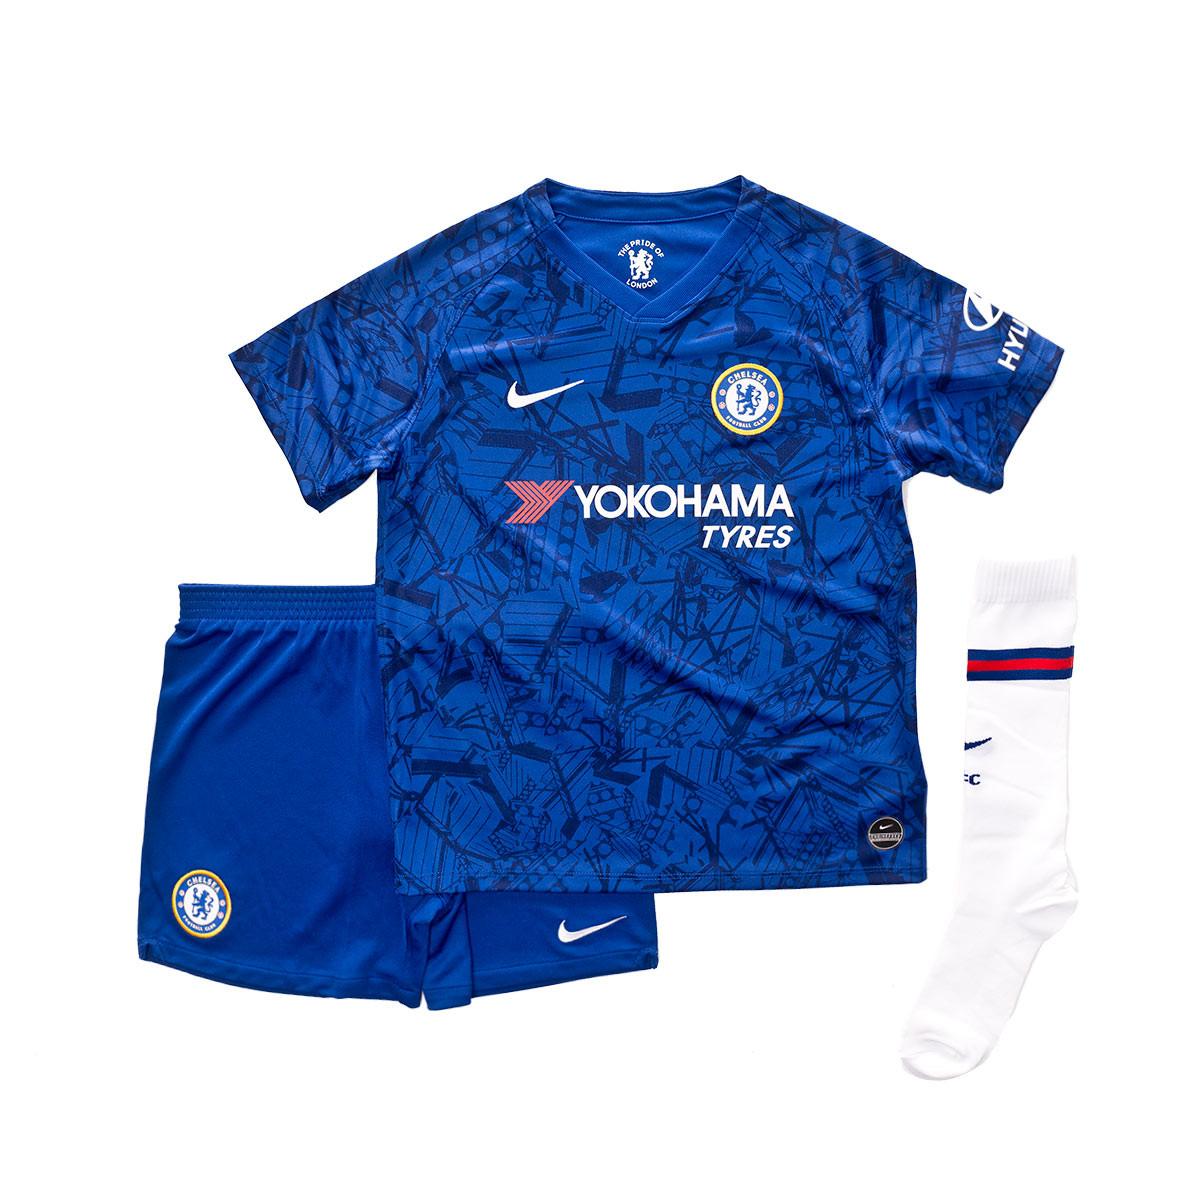 sale retailer 7a34a dd15b Conjunto Chelsea FC Breathe Primera Equipación 2019-2020 Niño Rush  blue-White